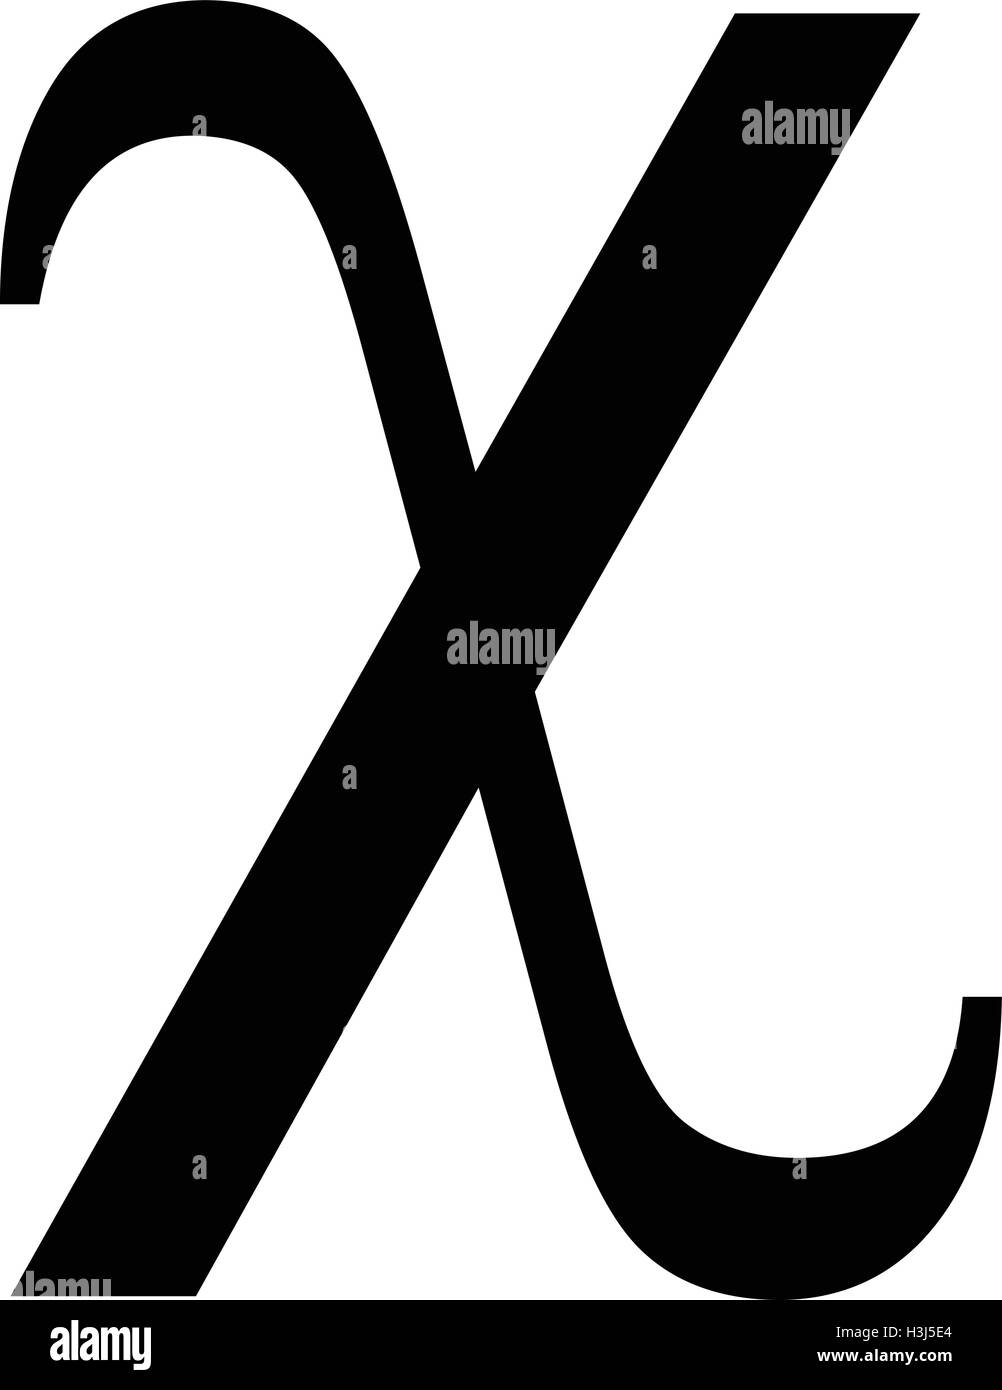 Greek alphabet vector uppercase lowercase stock photos greek chi greek letter icon chi symbol vector illustration stock image buycottarizona